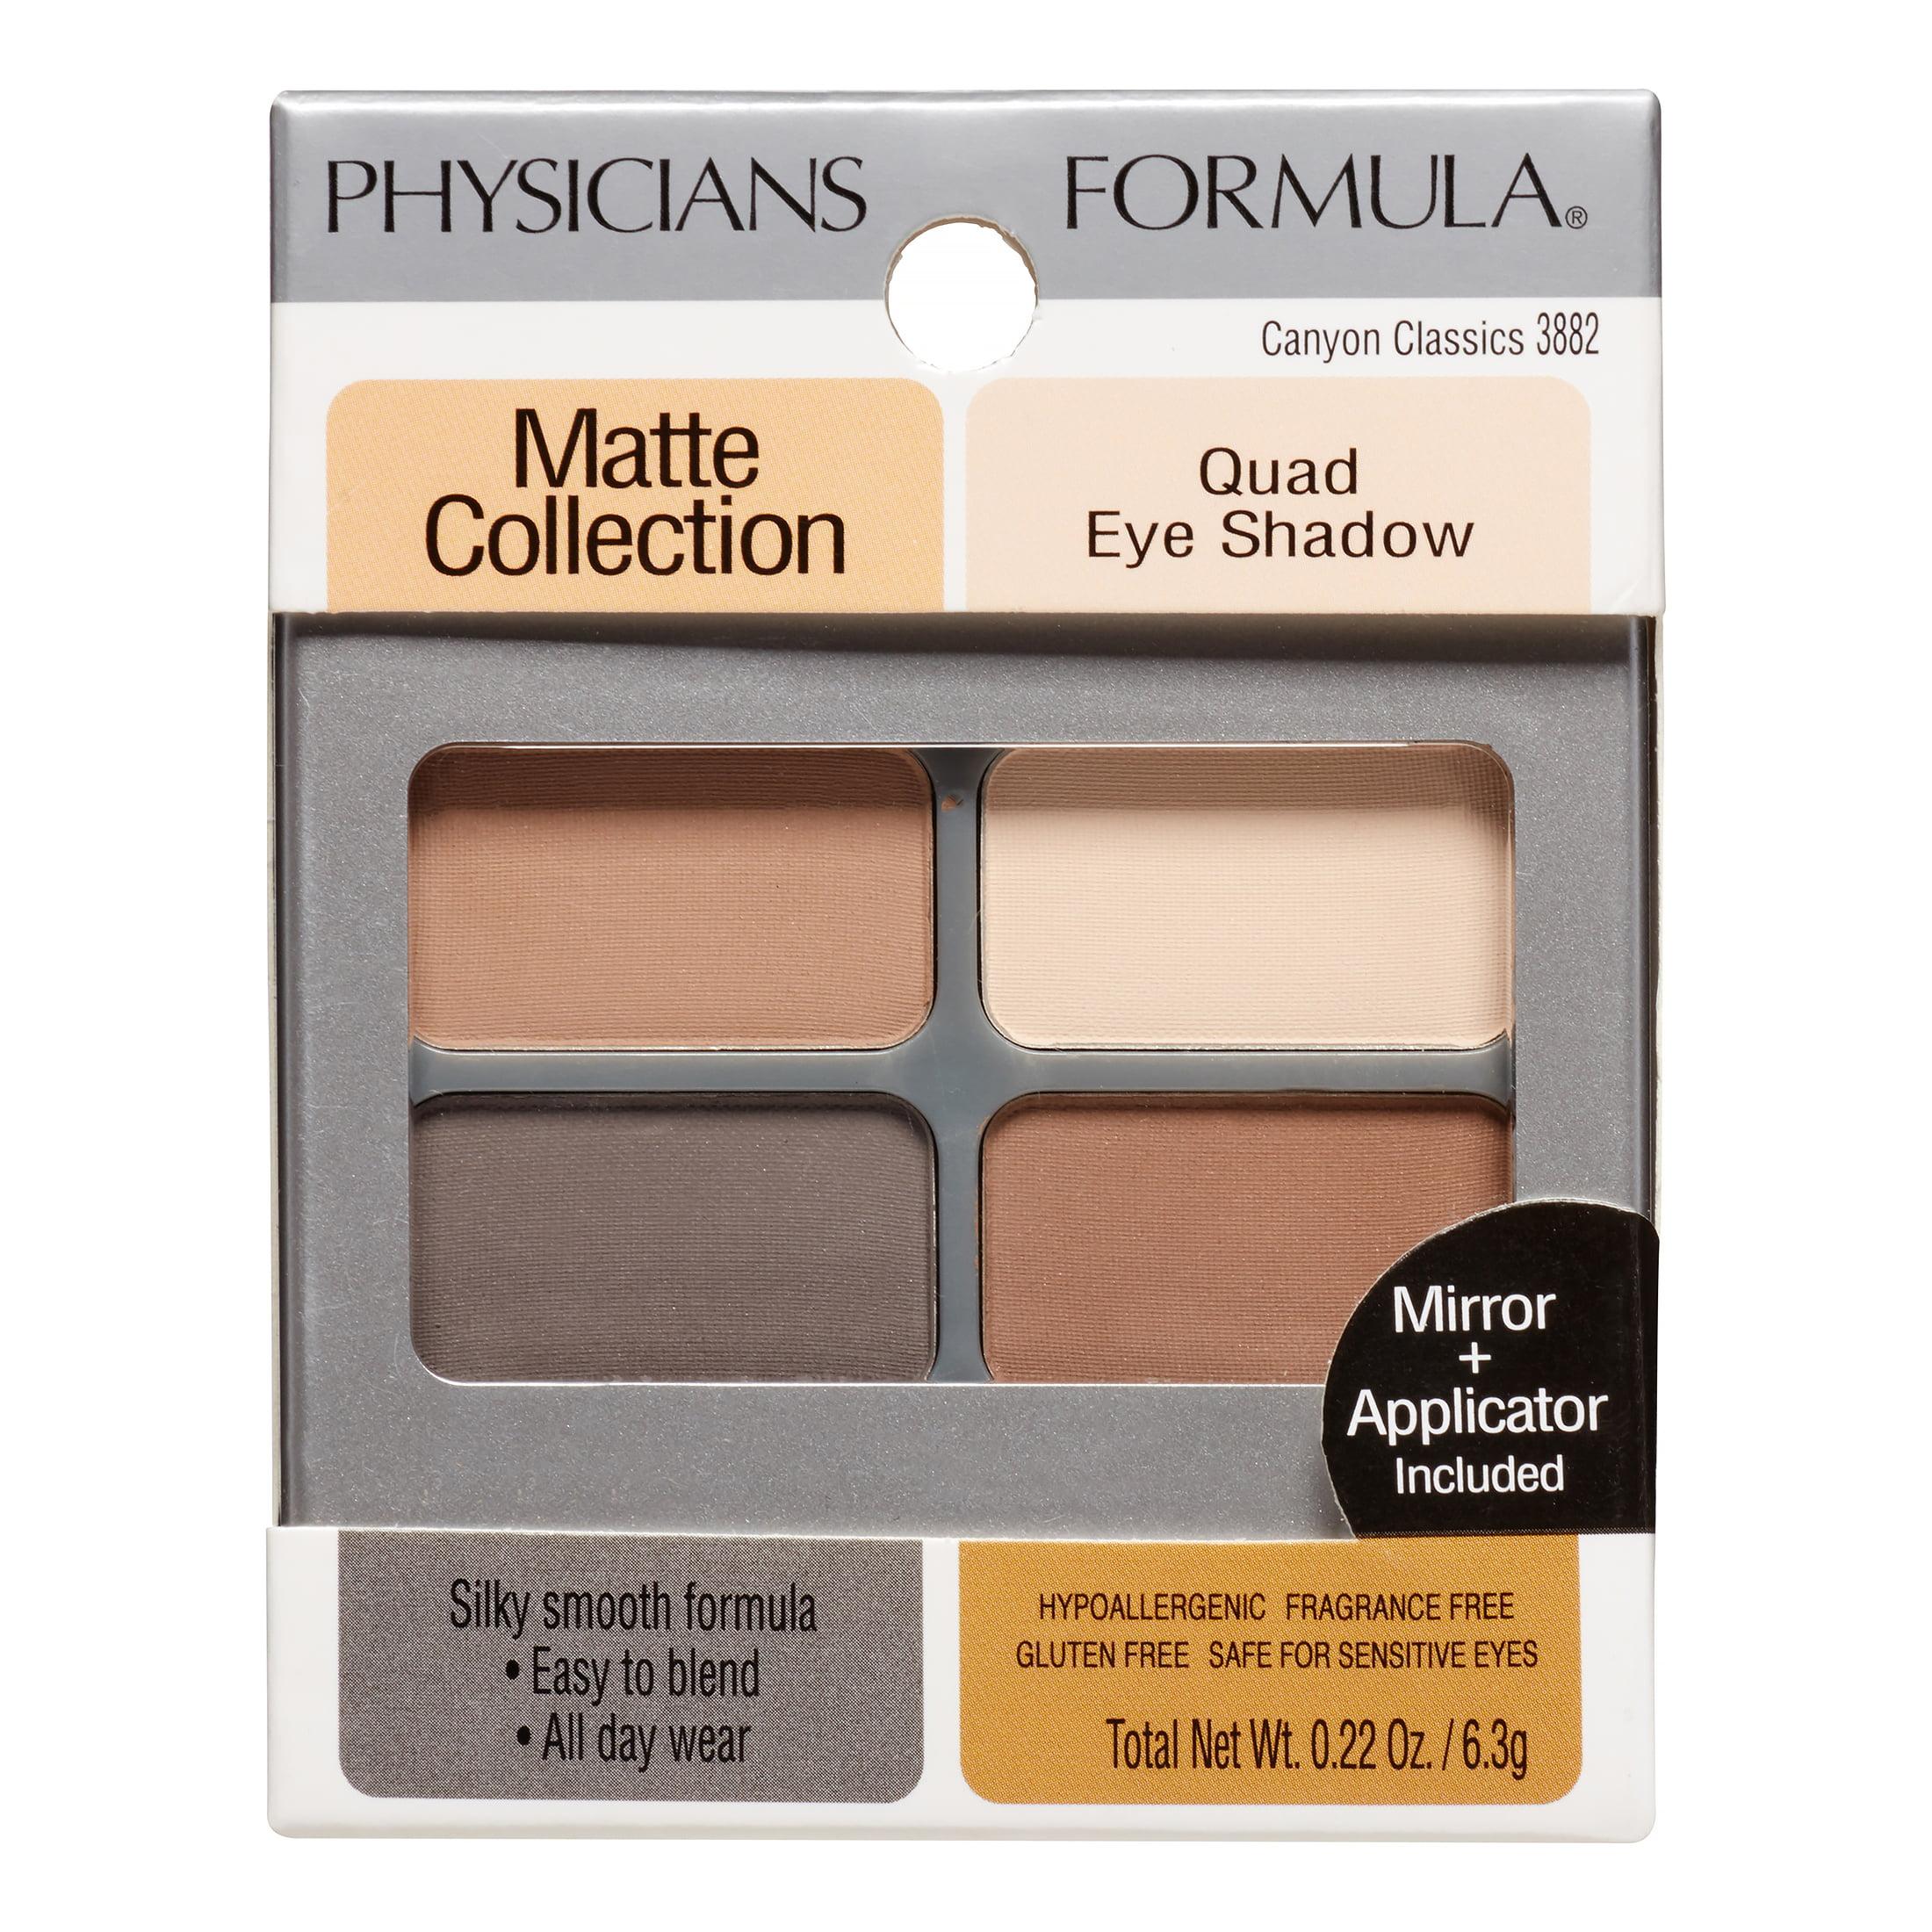 Physicians Formula Matte Collection Quad Eye Shadow Canyon Classics City Color Brow Medium